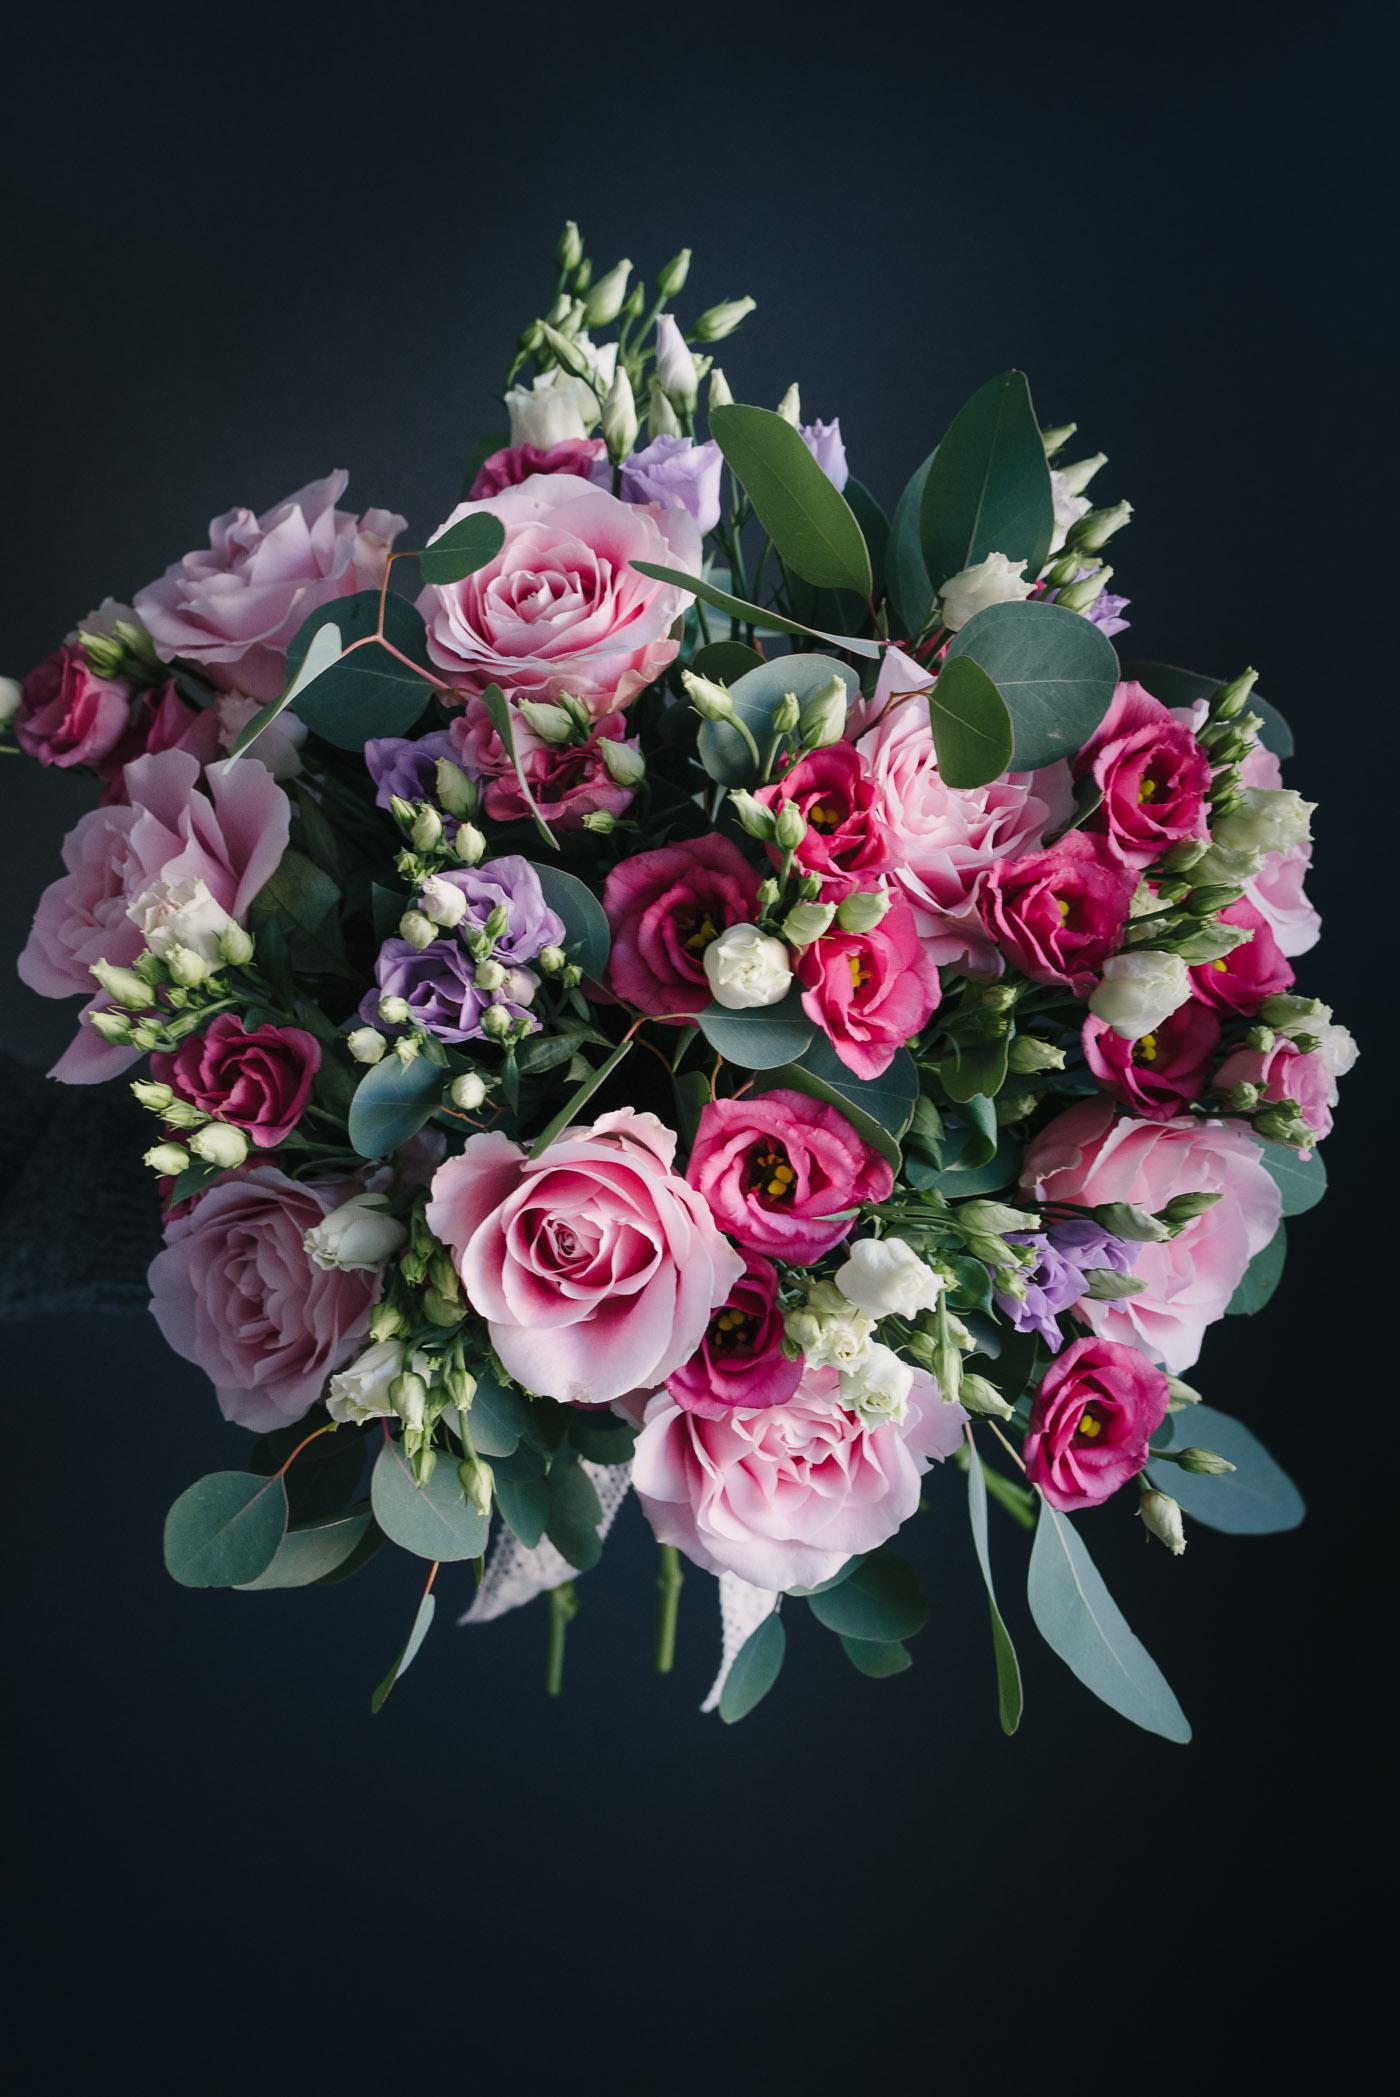 Buchet De Flori Cu Trandafiri Roz Și Lisianthus Roz